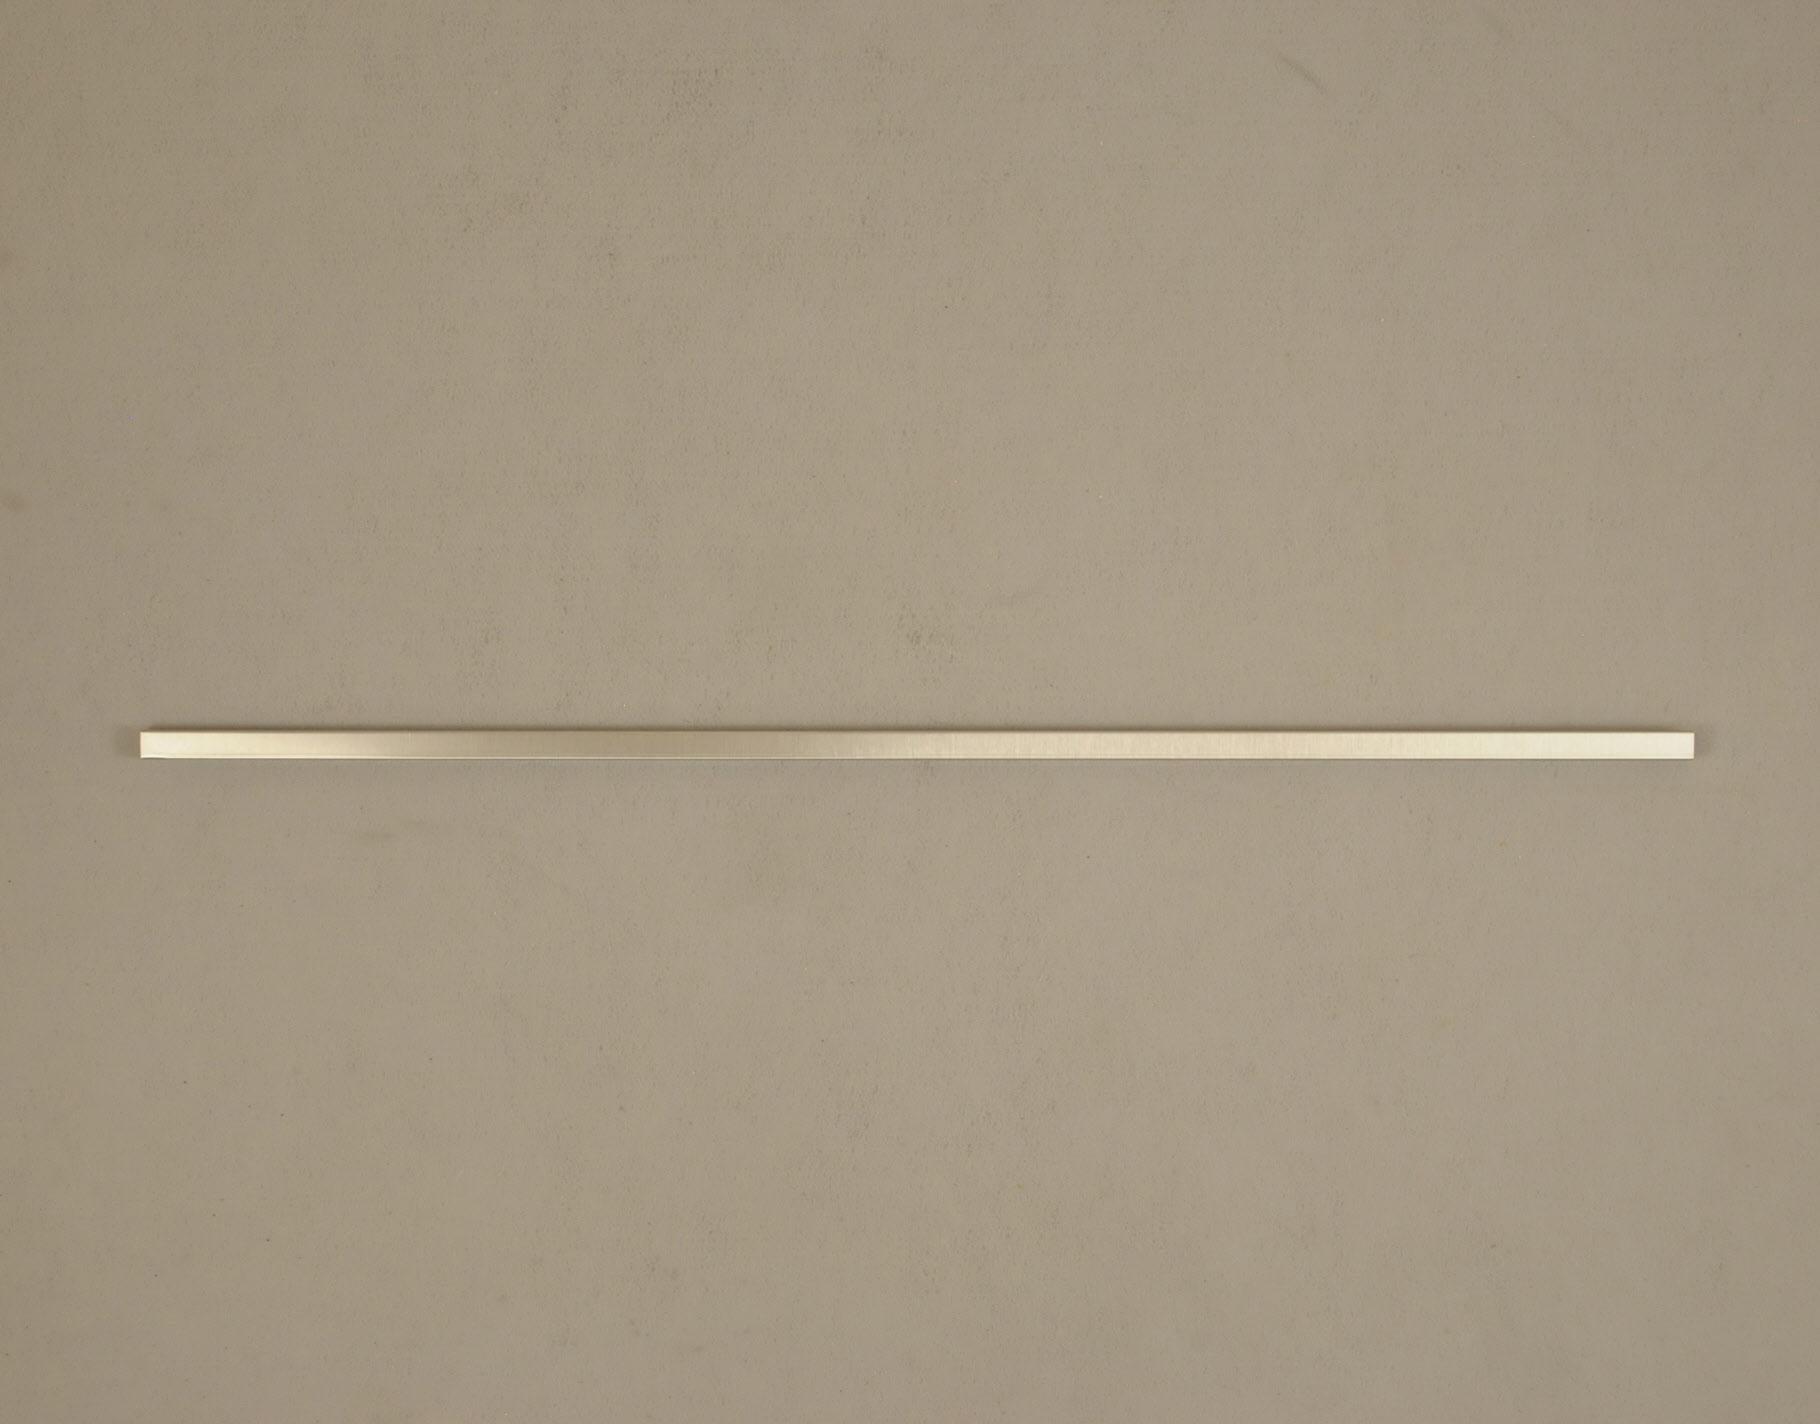 Maytag Range/Stove/Oven Part # WPW10144986 - Side Trim Piece